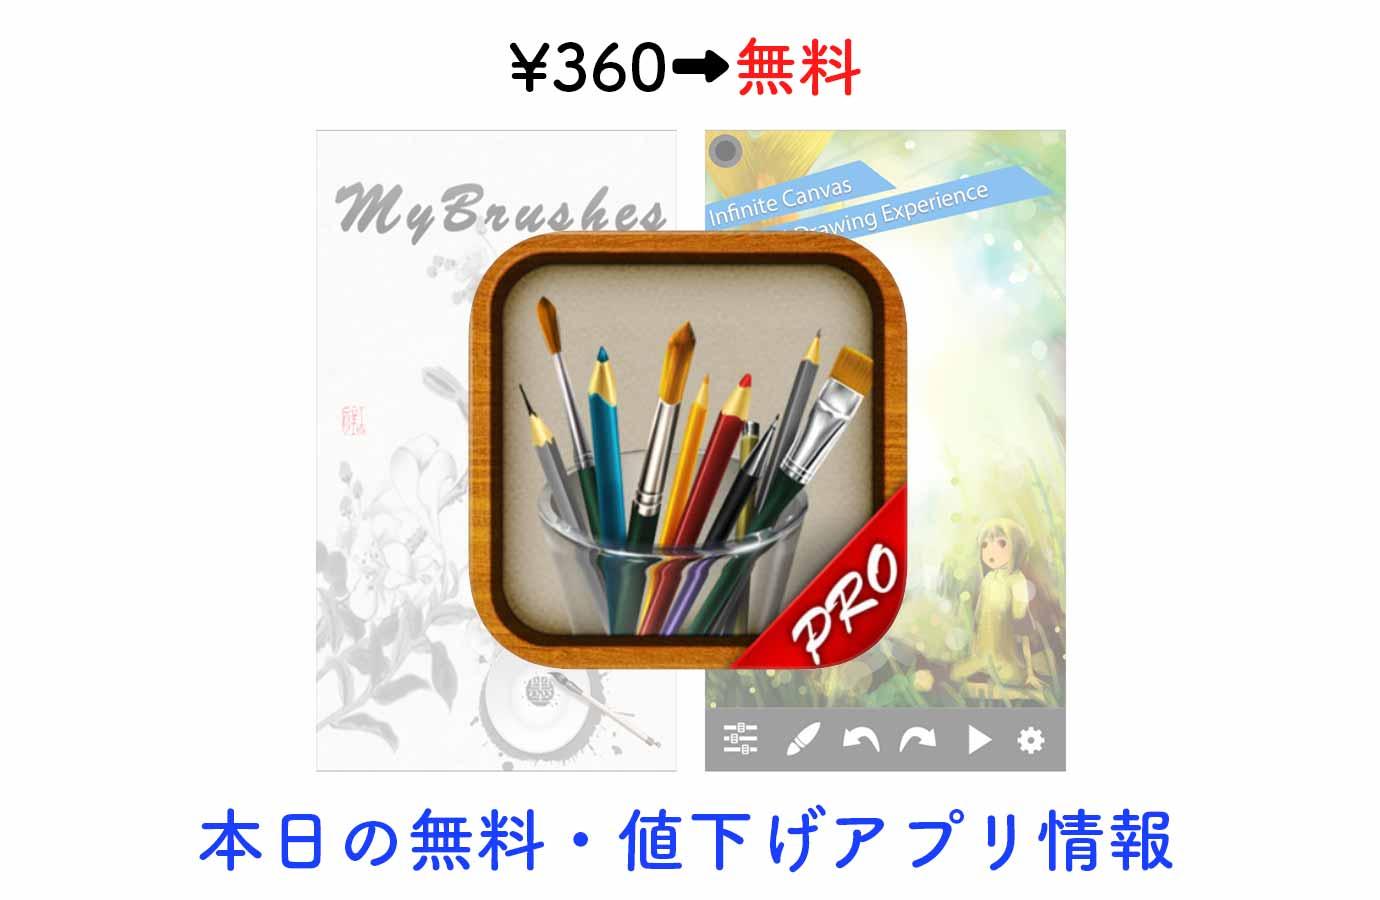 Appsale0729